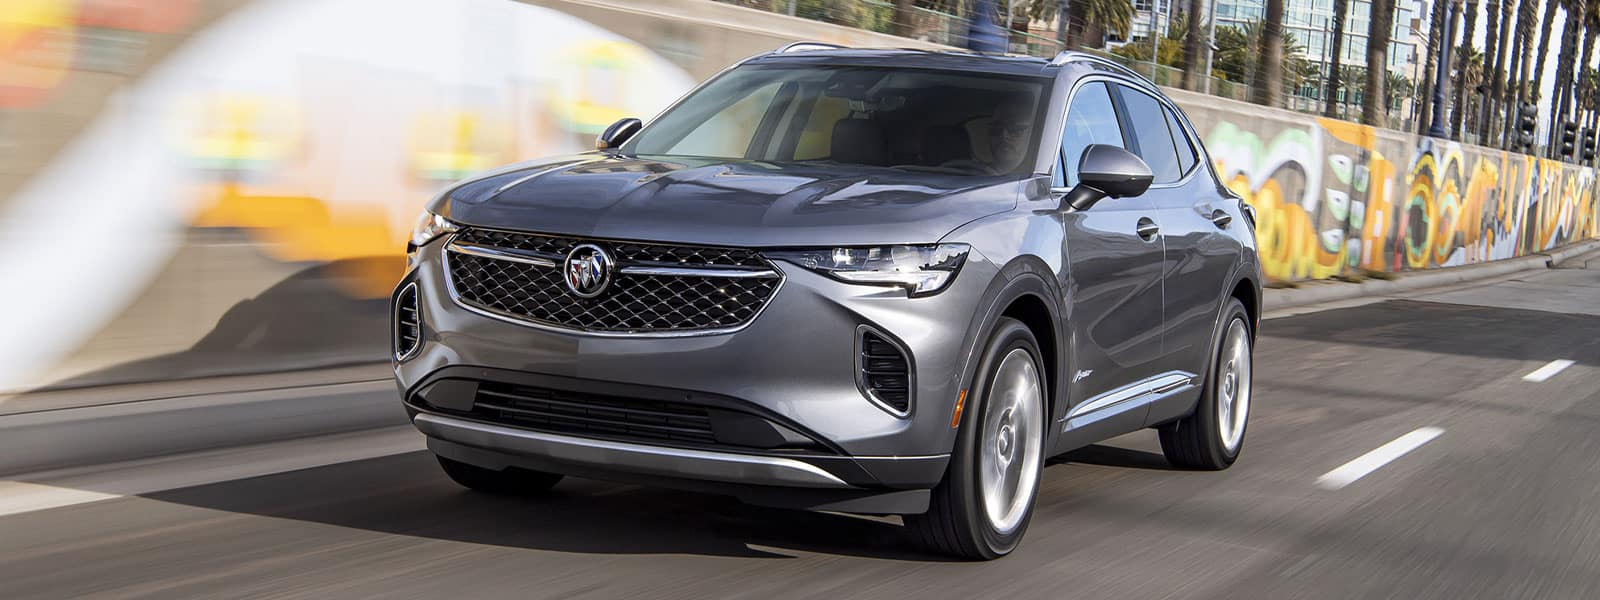 Buy all-new 2021 Buick Envision in Stanleytown Virginia